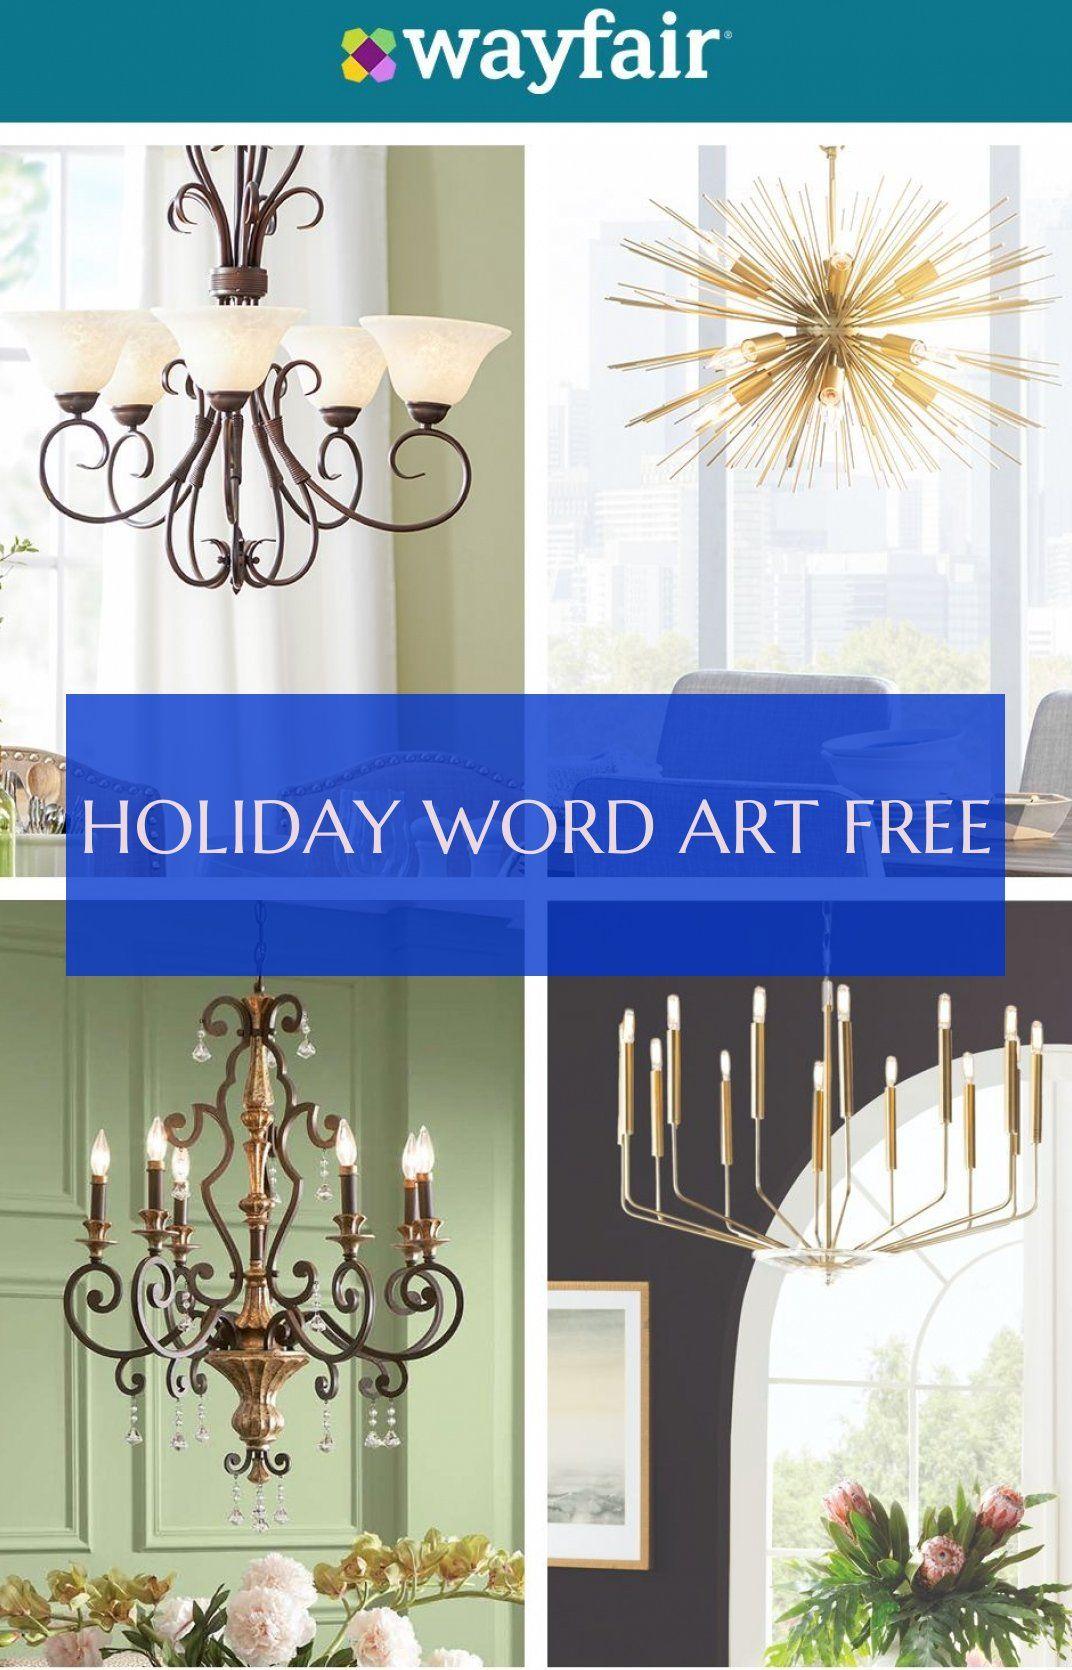 Mot De Vacances Art Gratuit Holiday Word Art Free